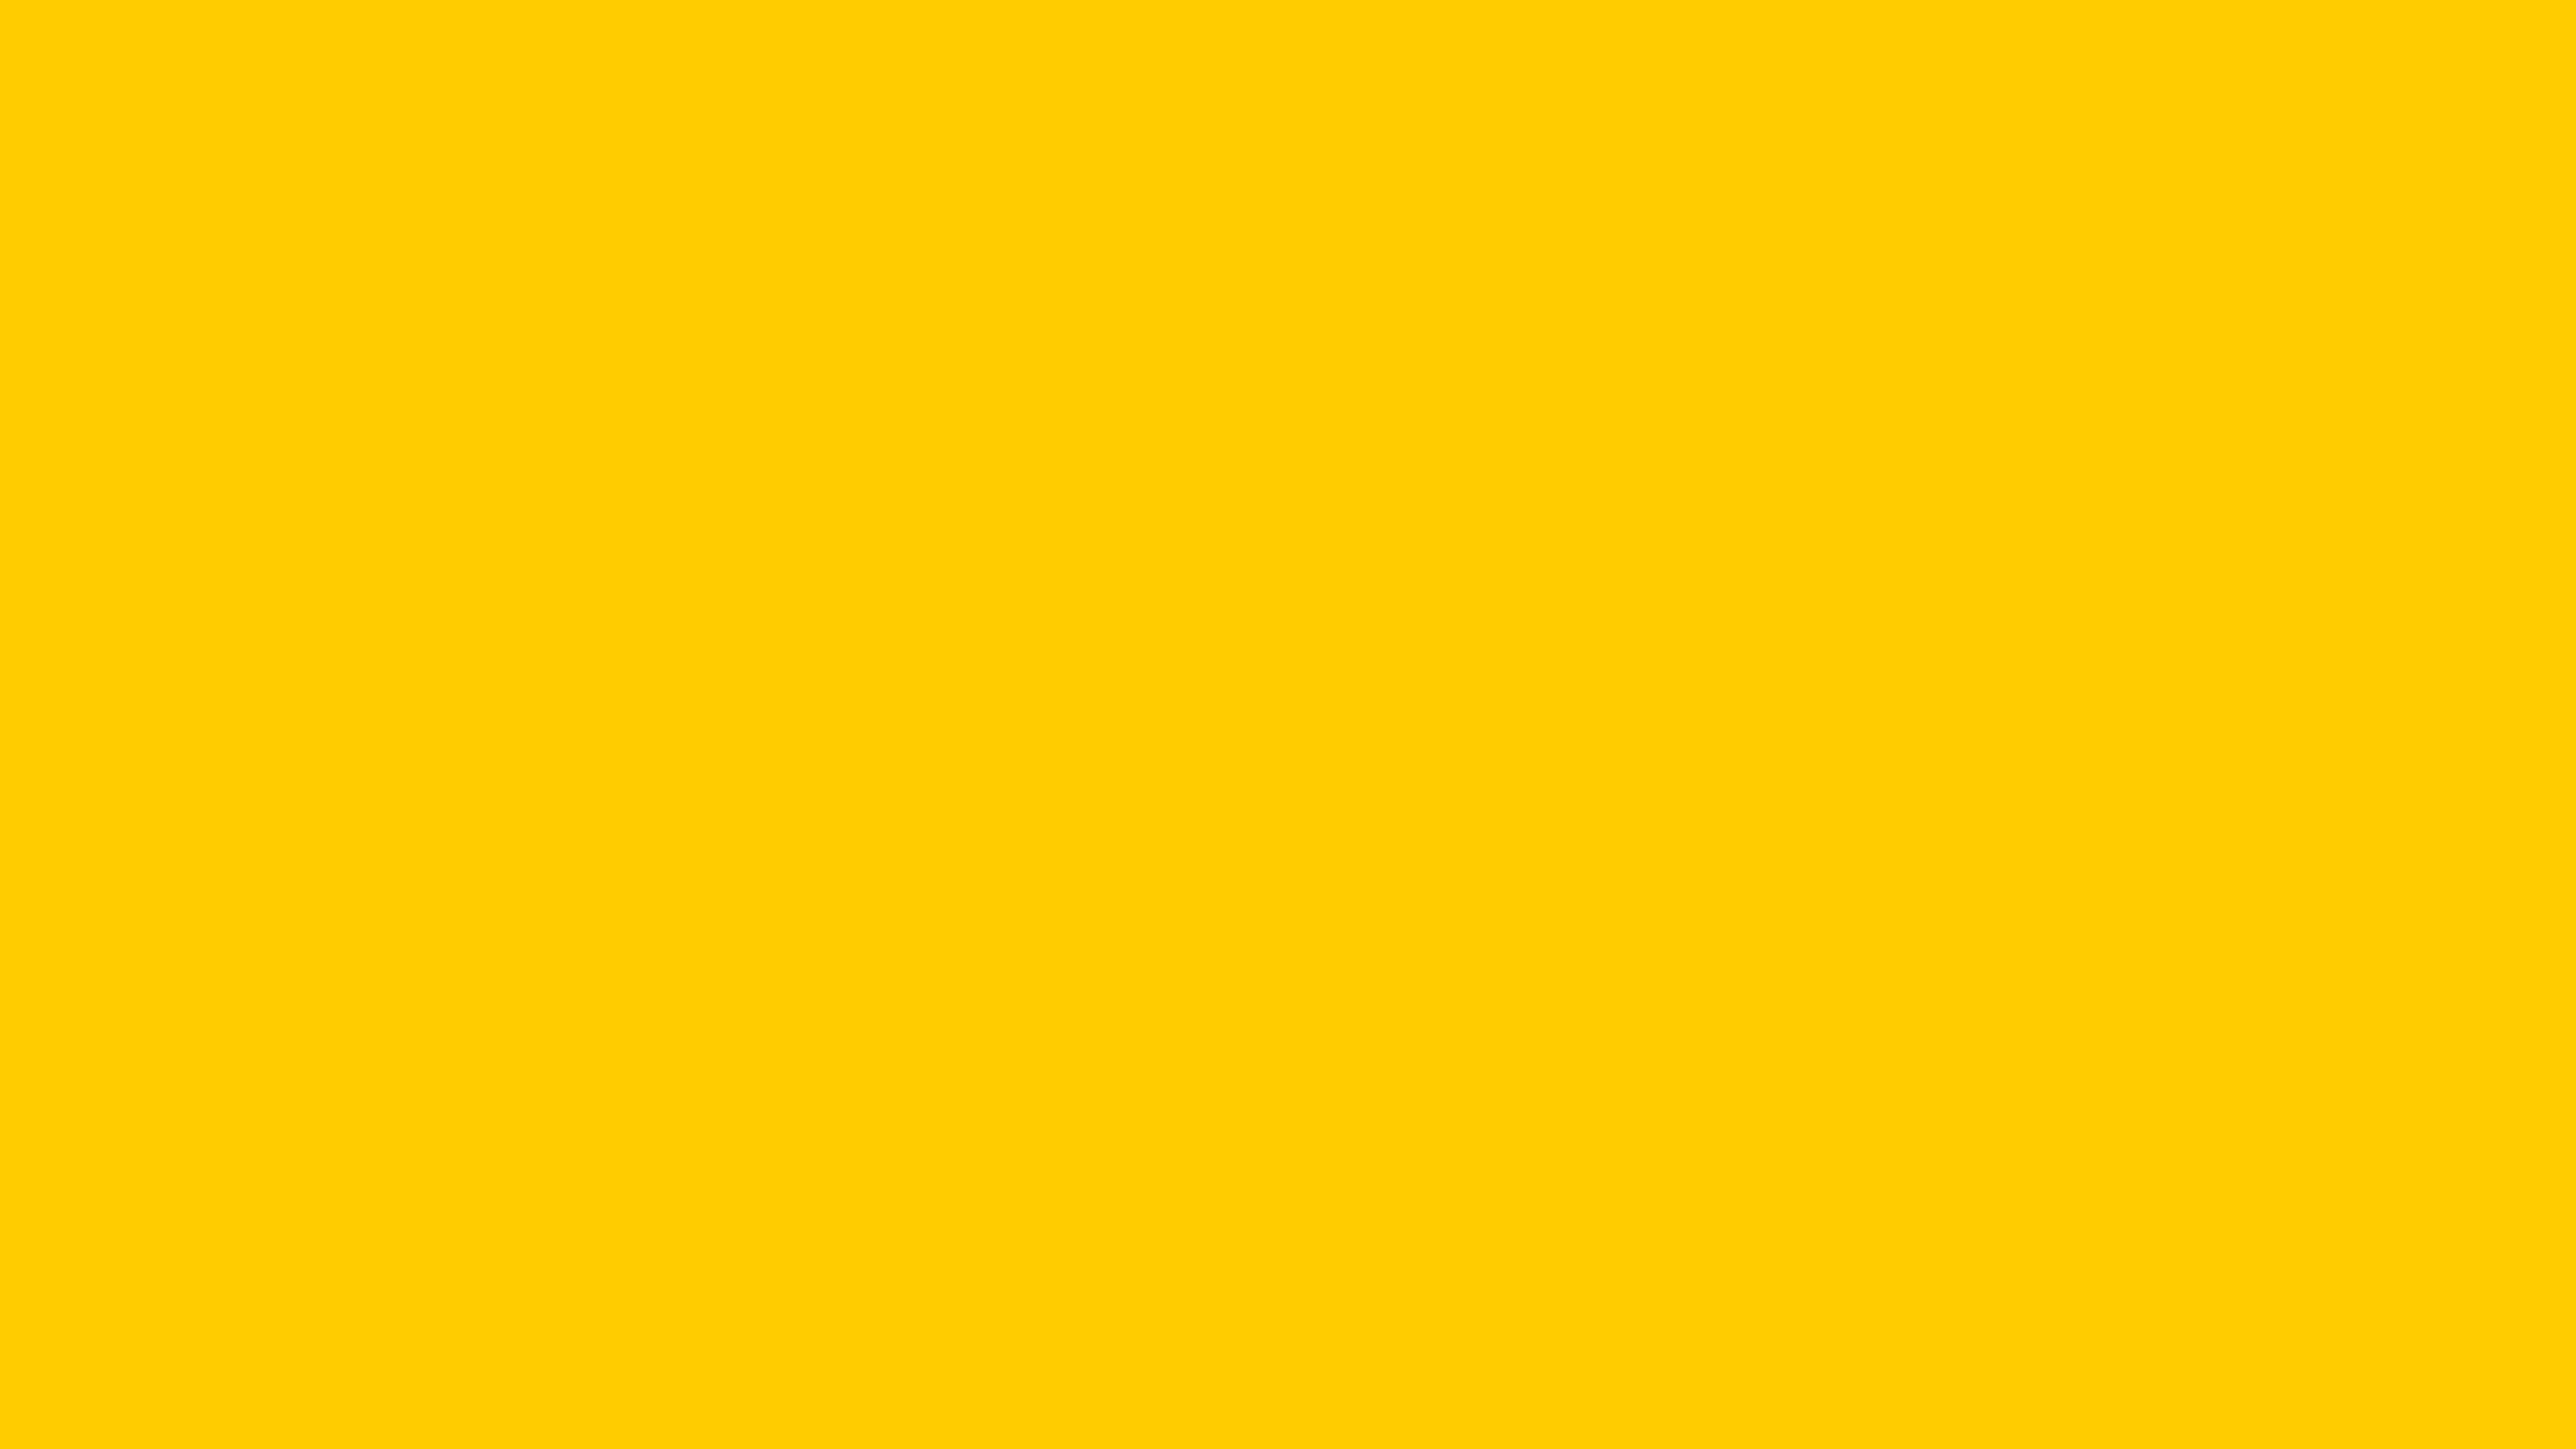 Diary Of A Wimpy Kid Complete Set 1-11 Lot Series (Pdf-eB00ks)